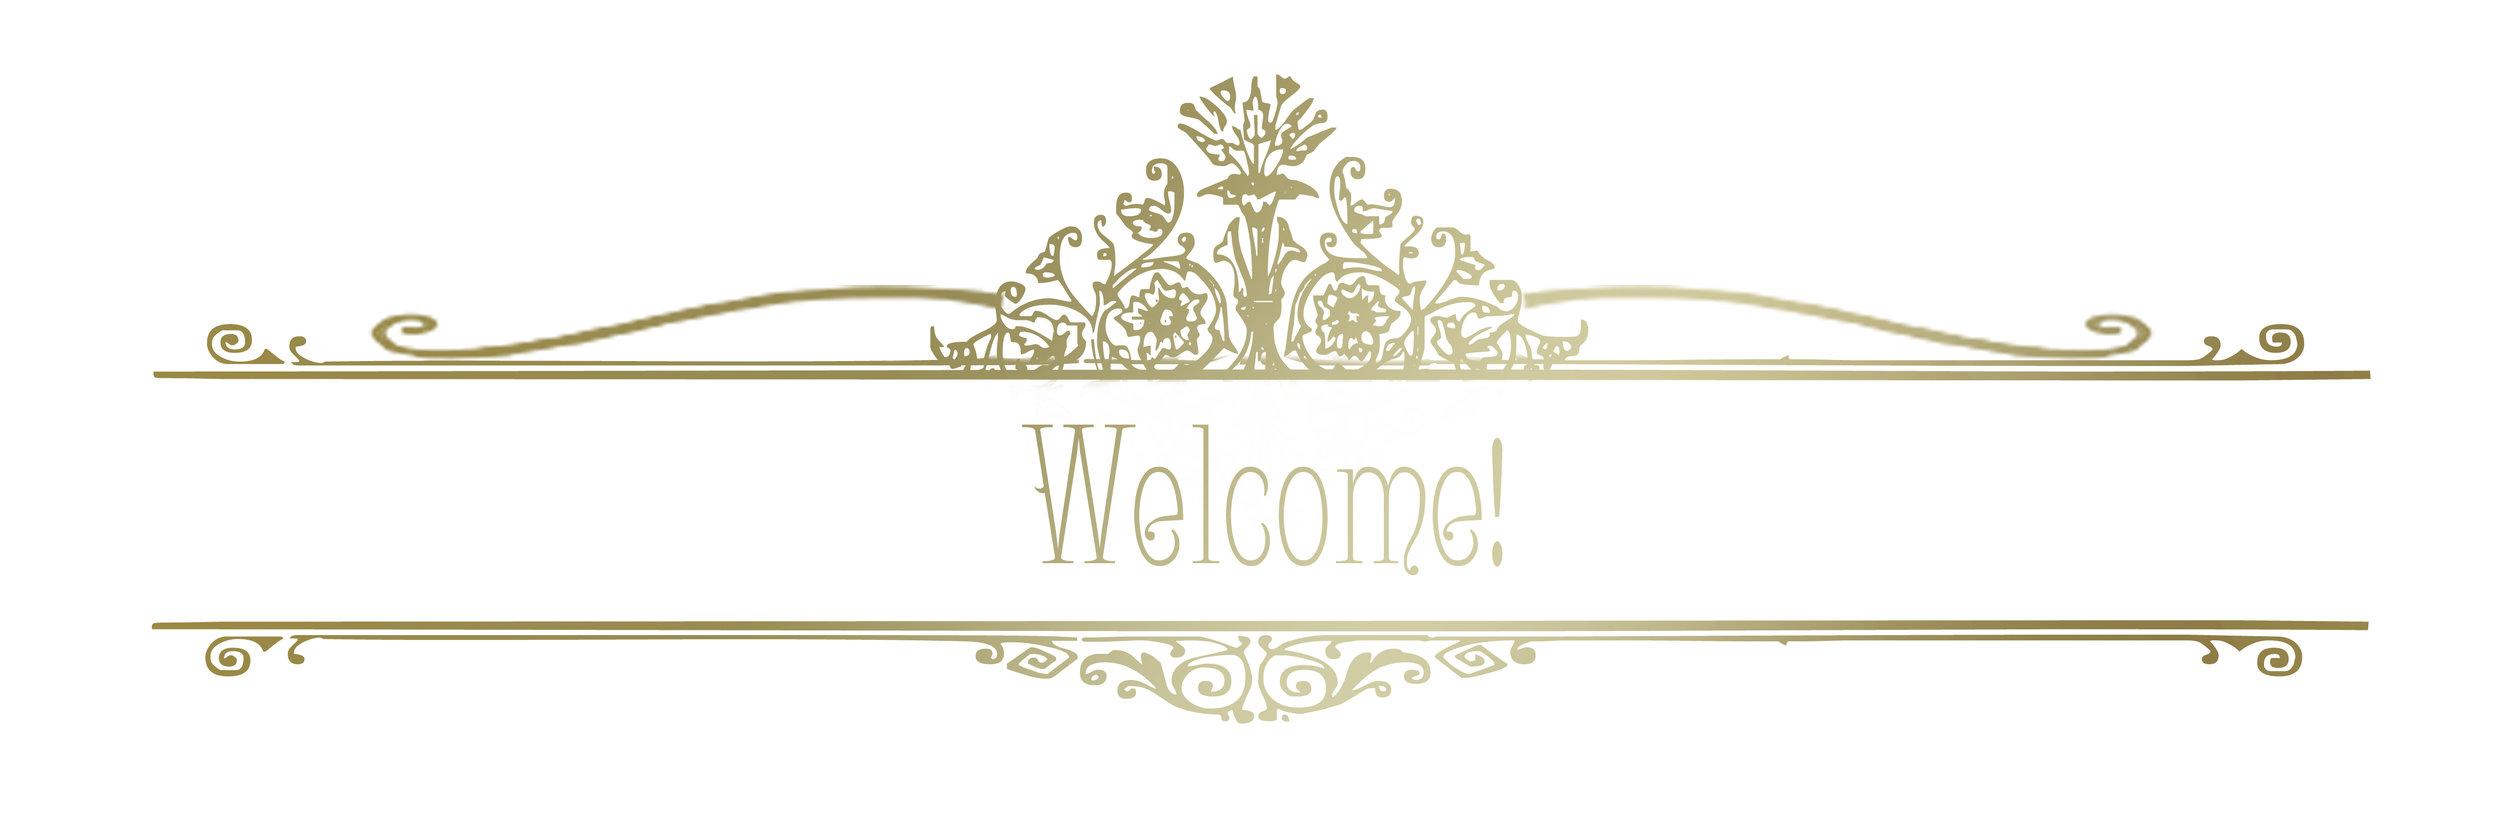 Banner - Welcome.jpg